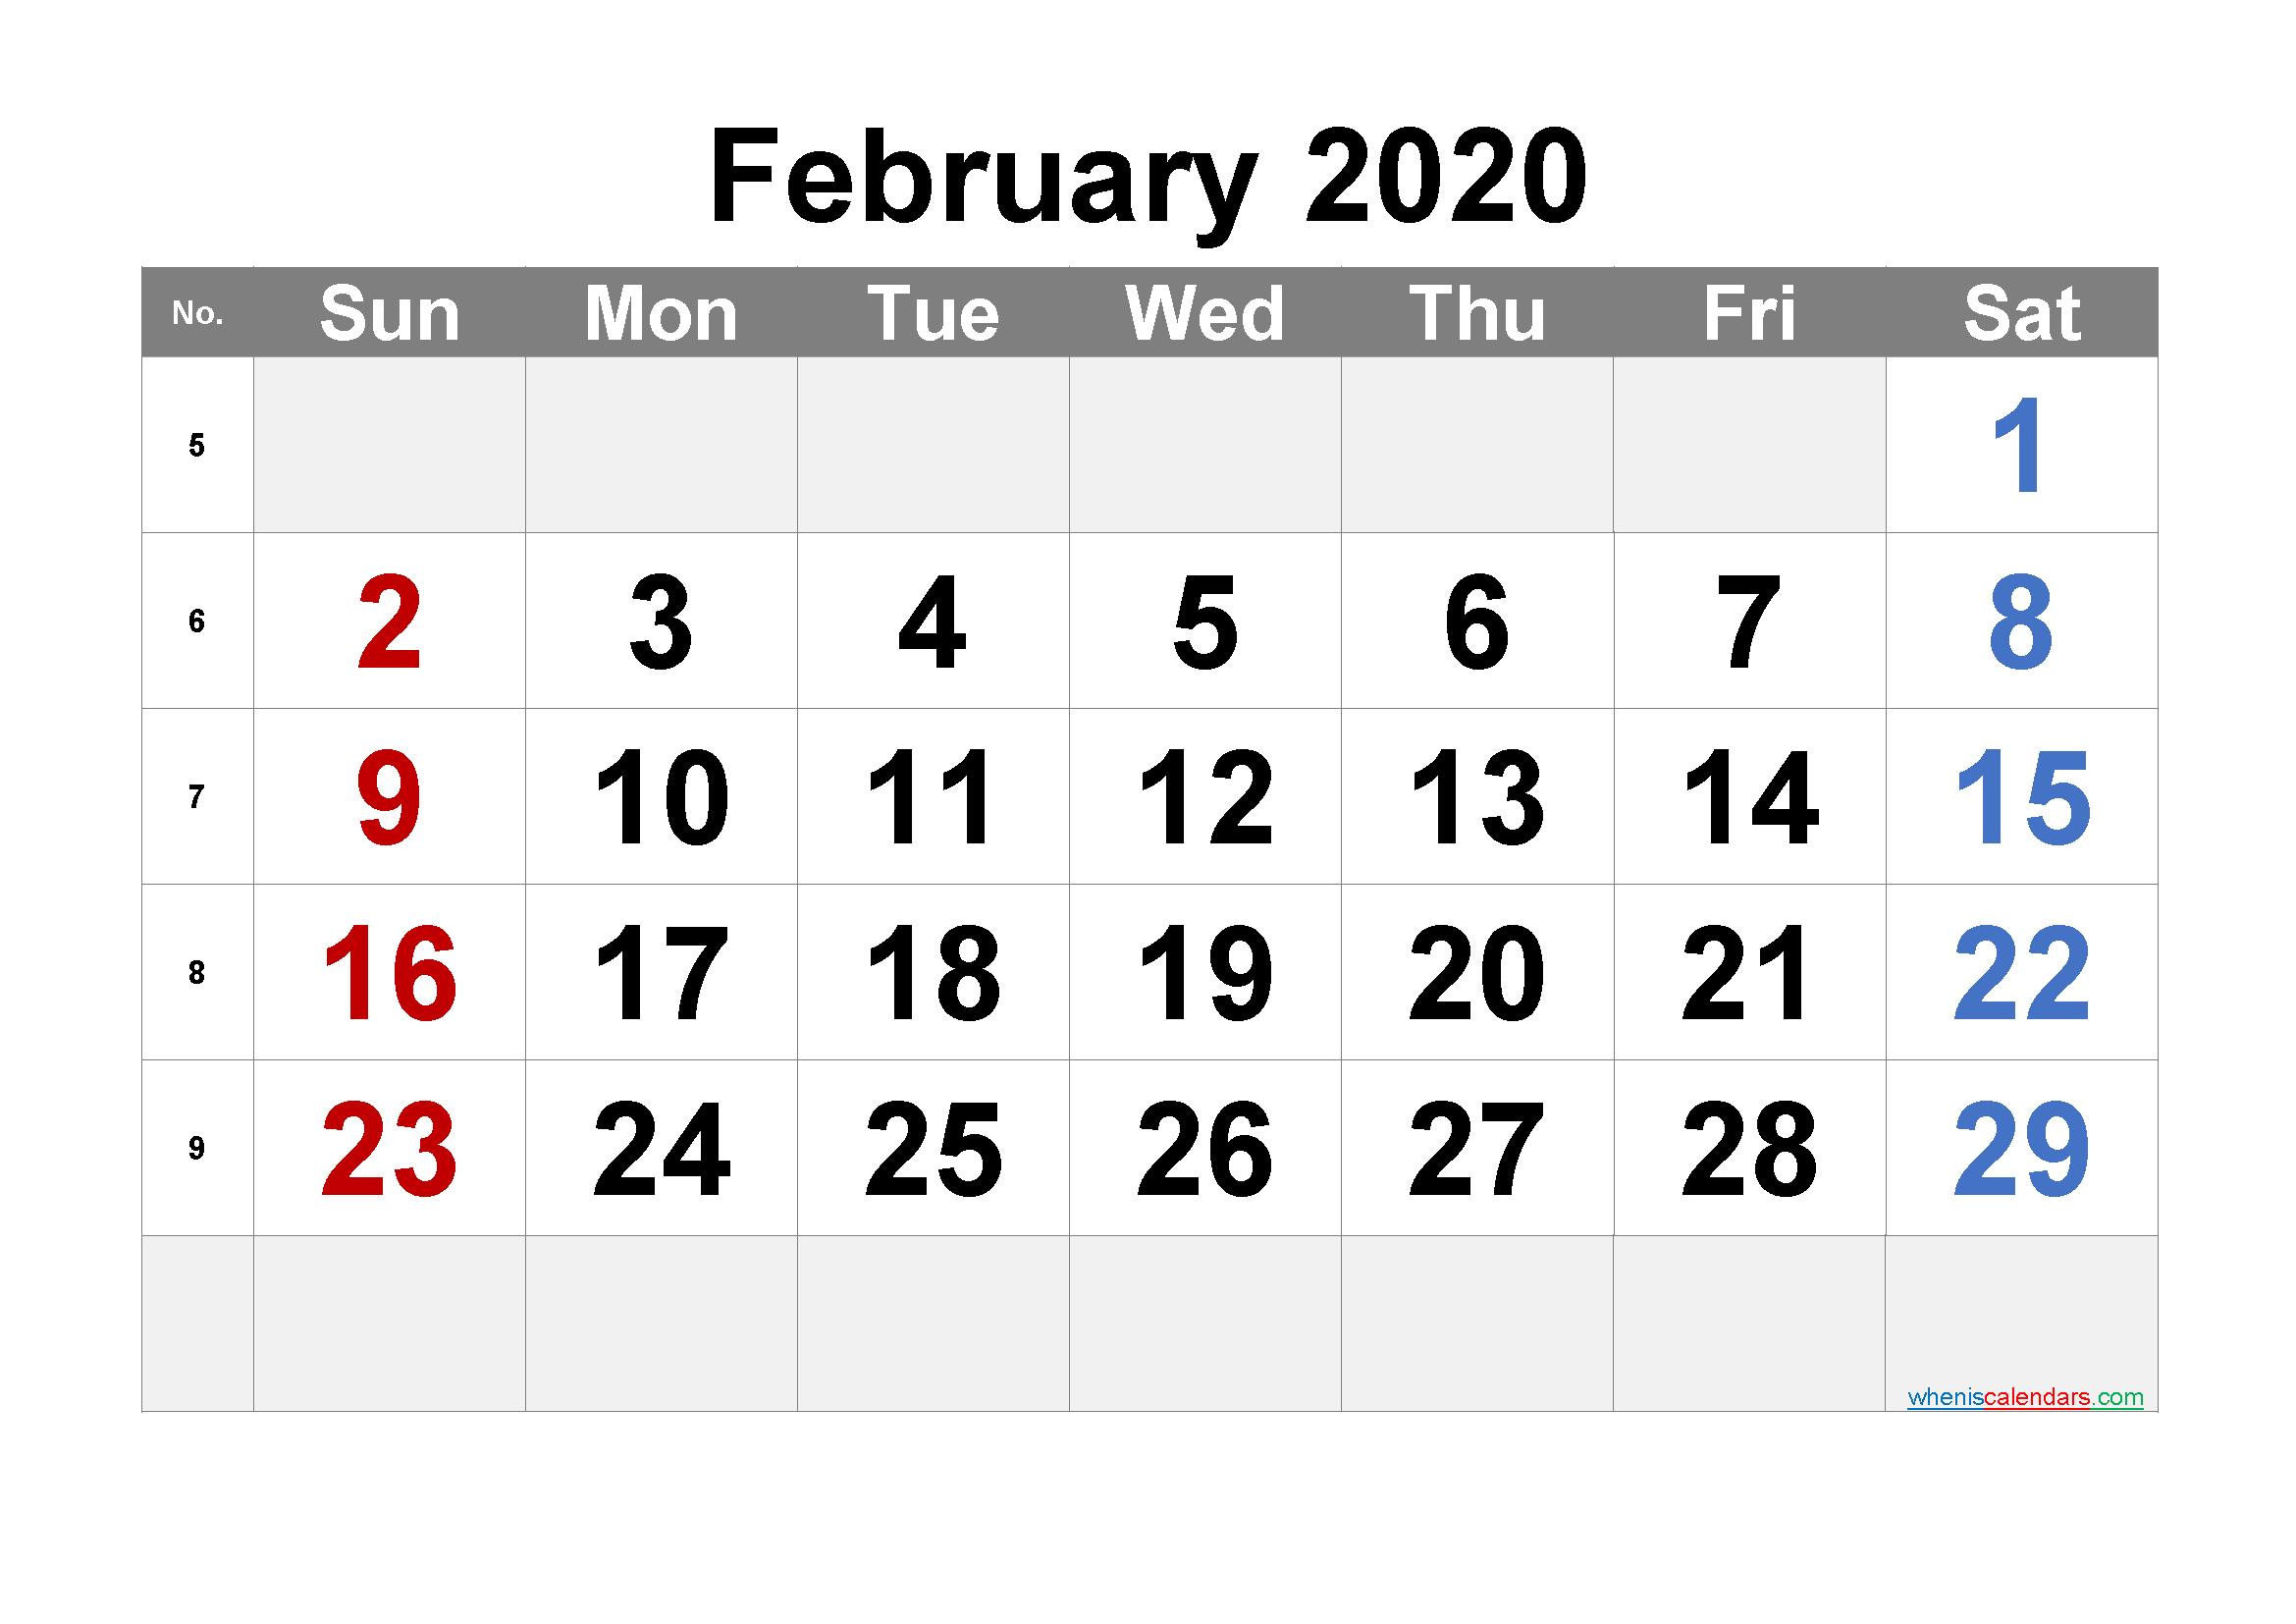 Free Printable February 2020 Calendar with Week Numbers